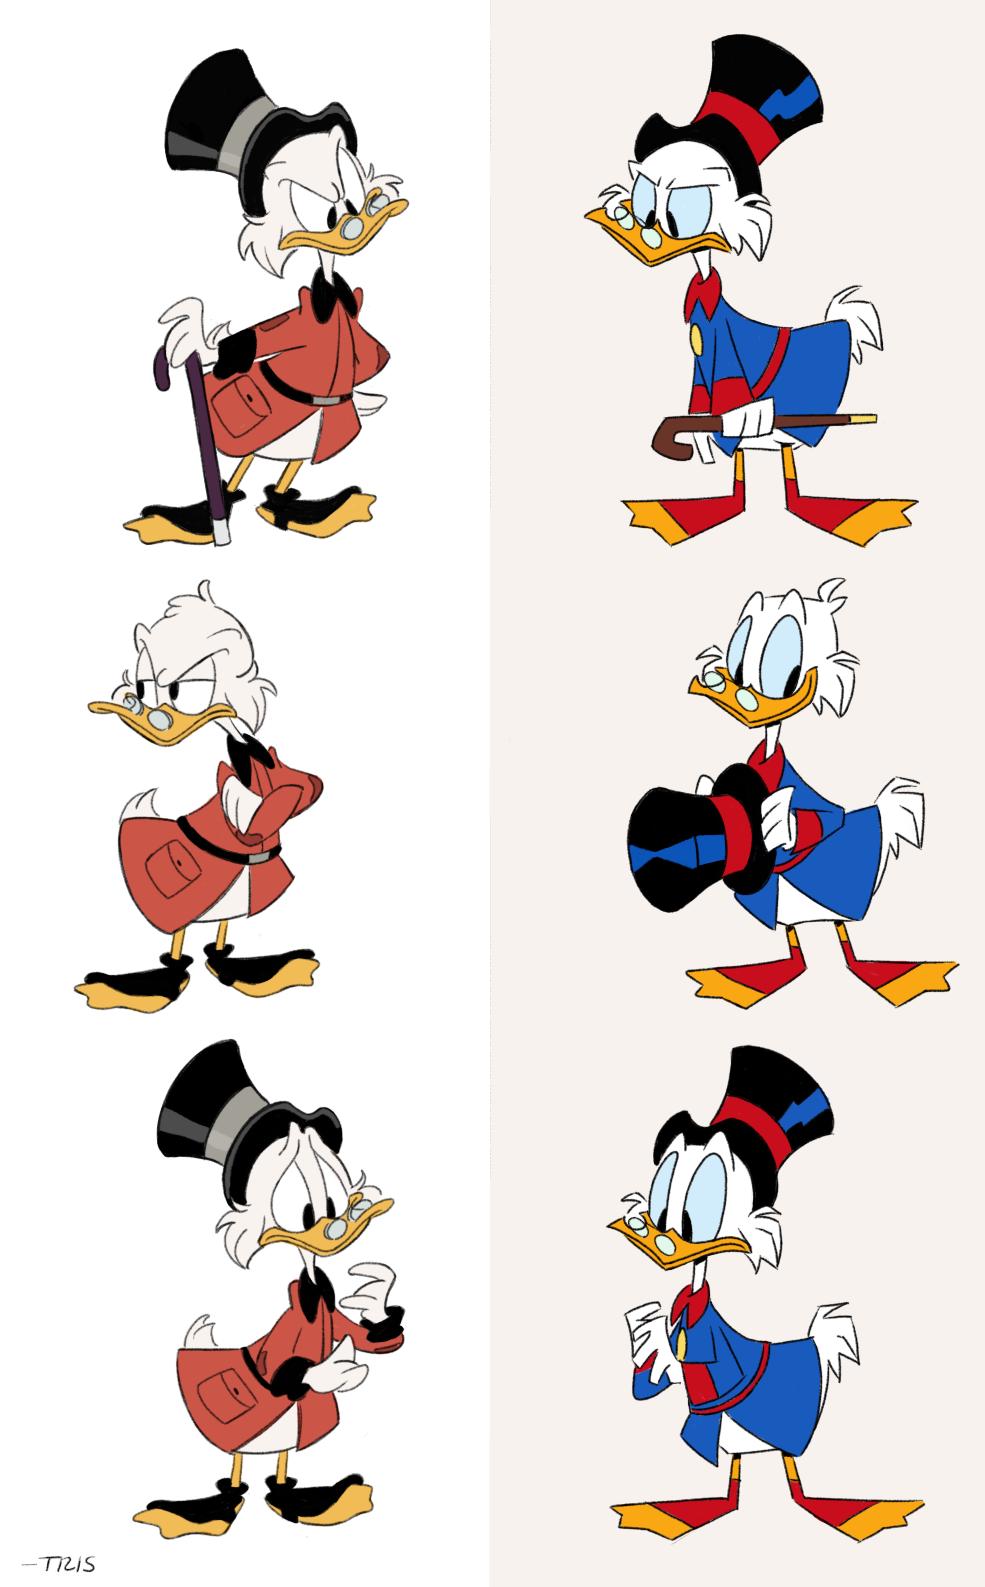 Walt Disney Ducktales Remastered Scrooge McDuck Pin